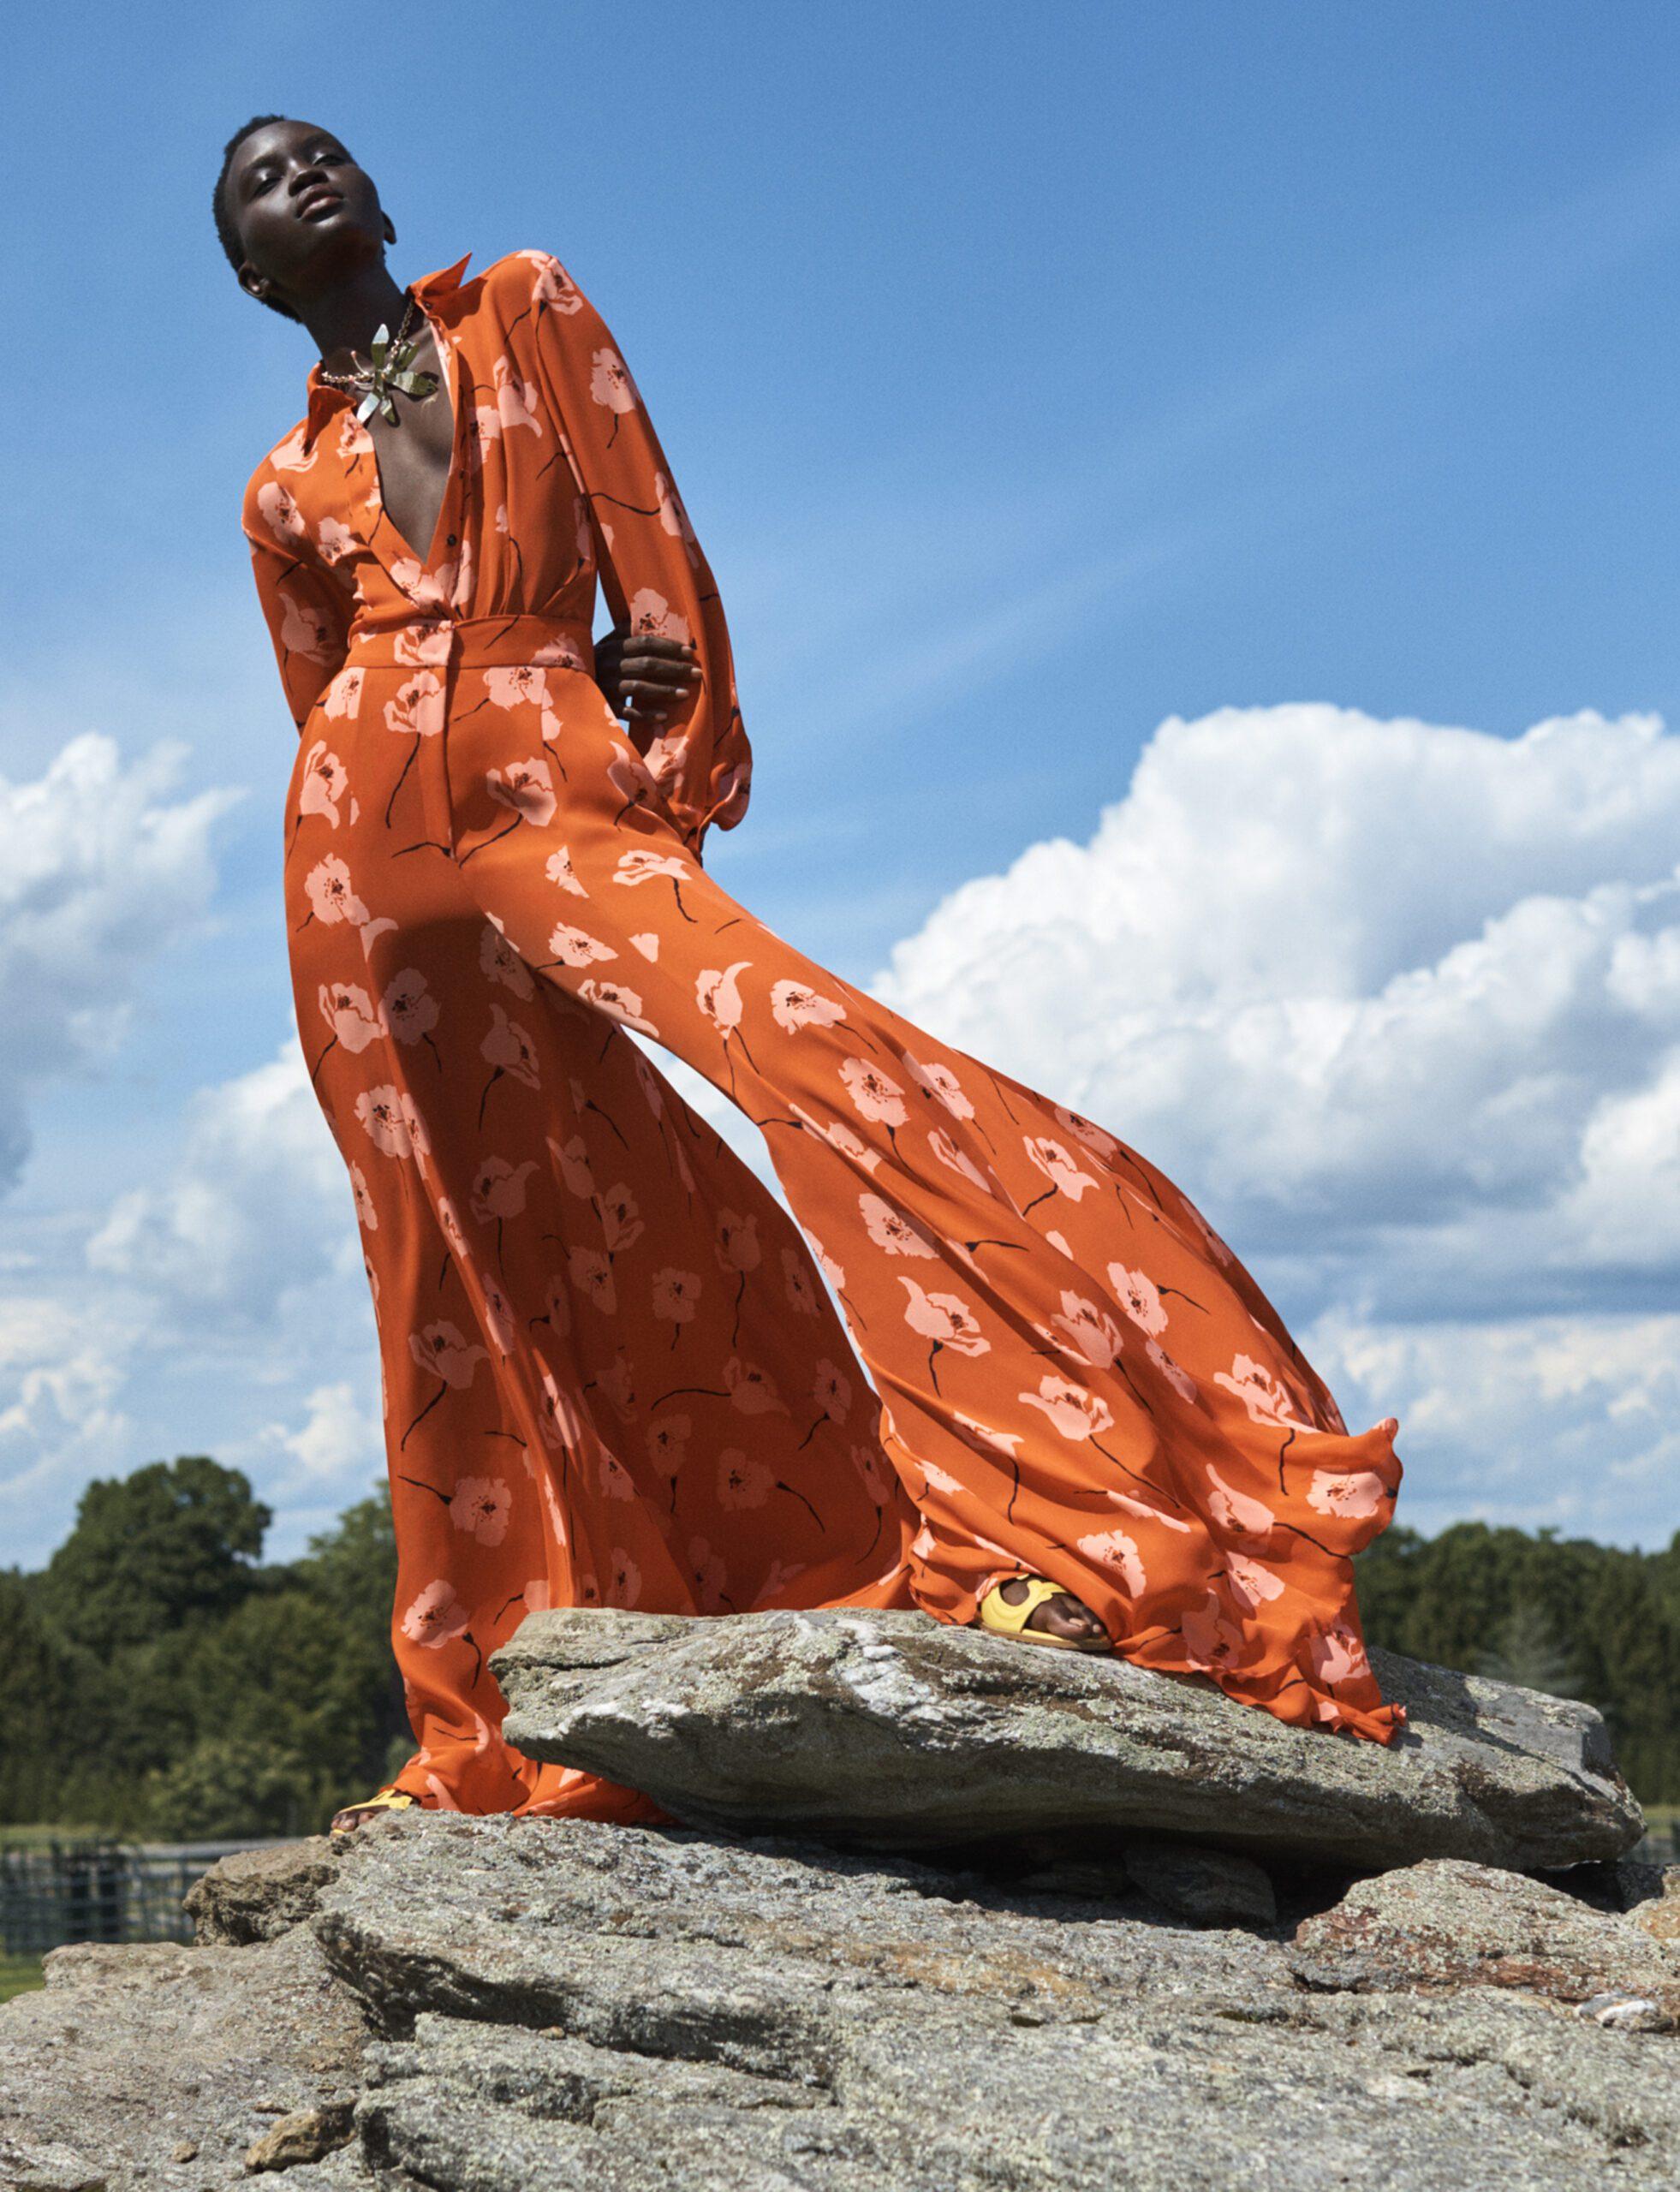 Jumpsuit: Πώς να φορέσεις αυτό το stylish fashion item το καλοκαίρι